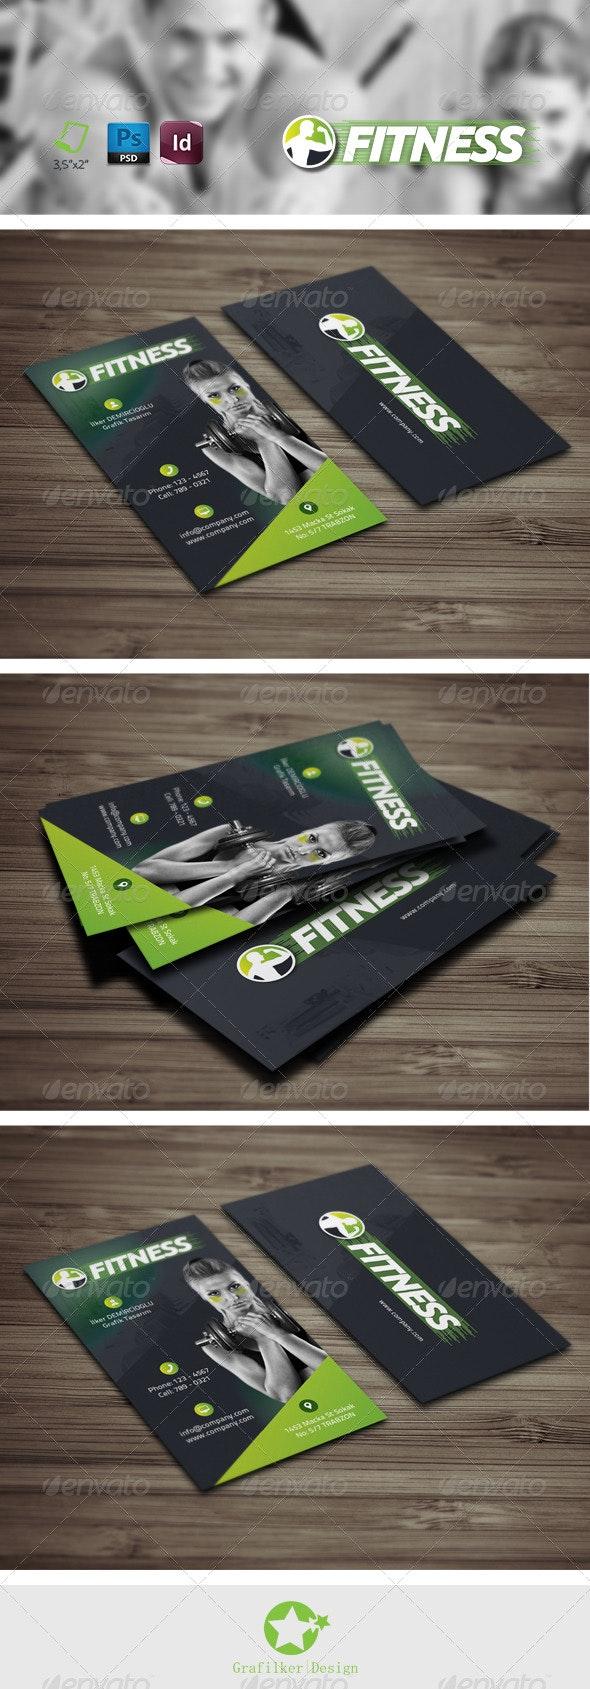 Fitness Salon Business Card Templates - Business Cards Print Templates